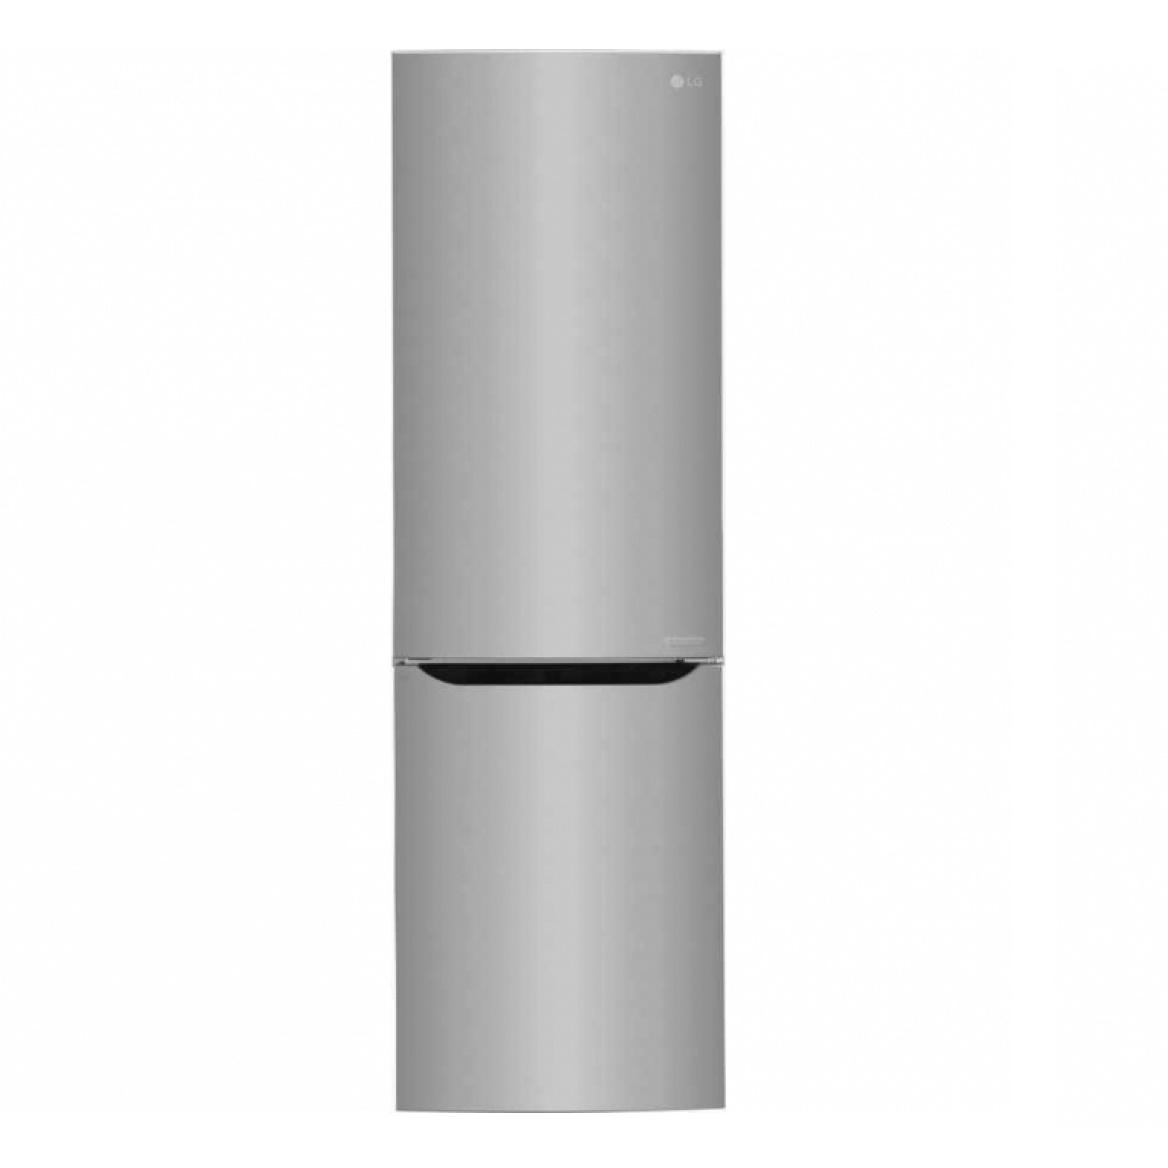 LG kombinovani frižider GBB59PZRZS - Inelektronik